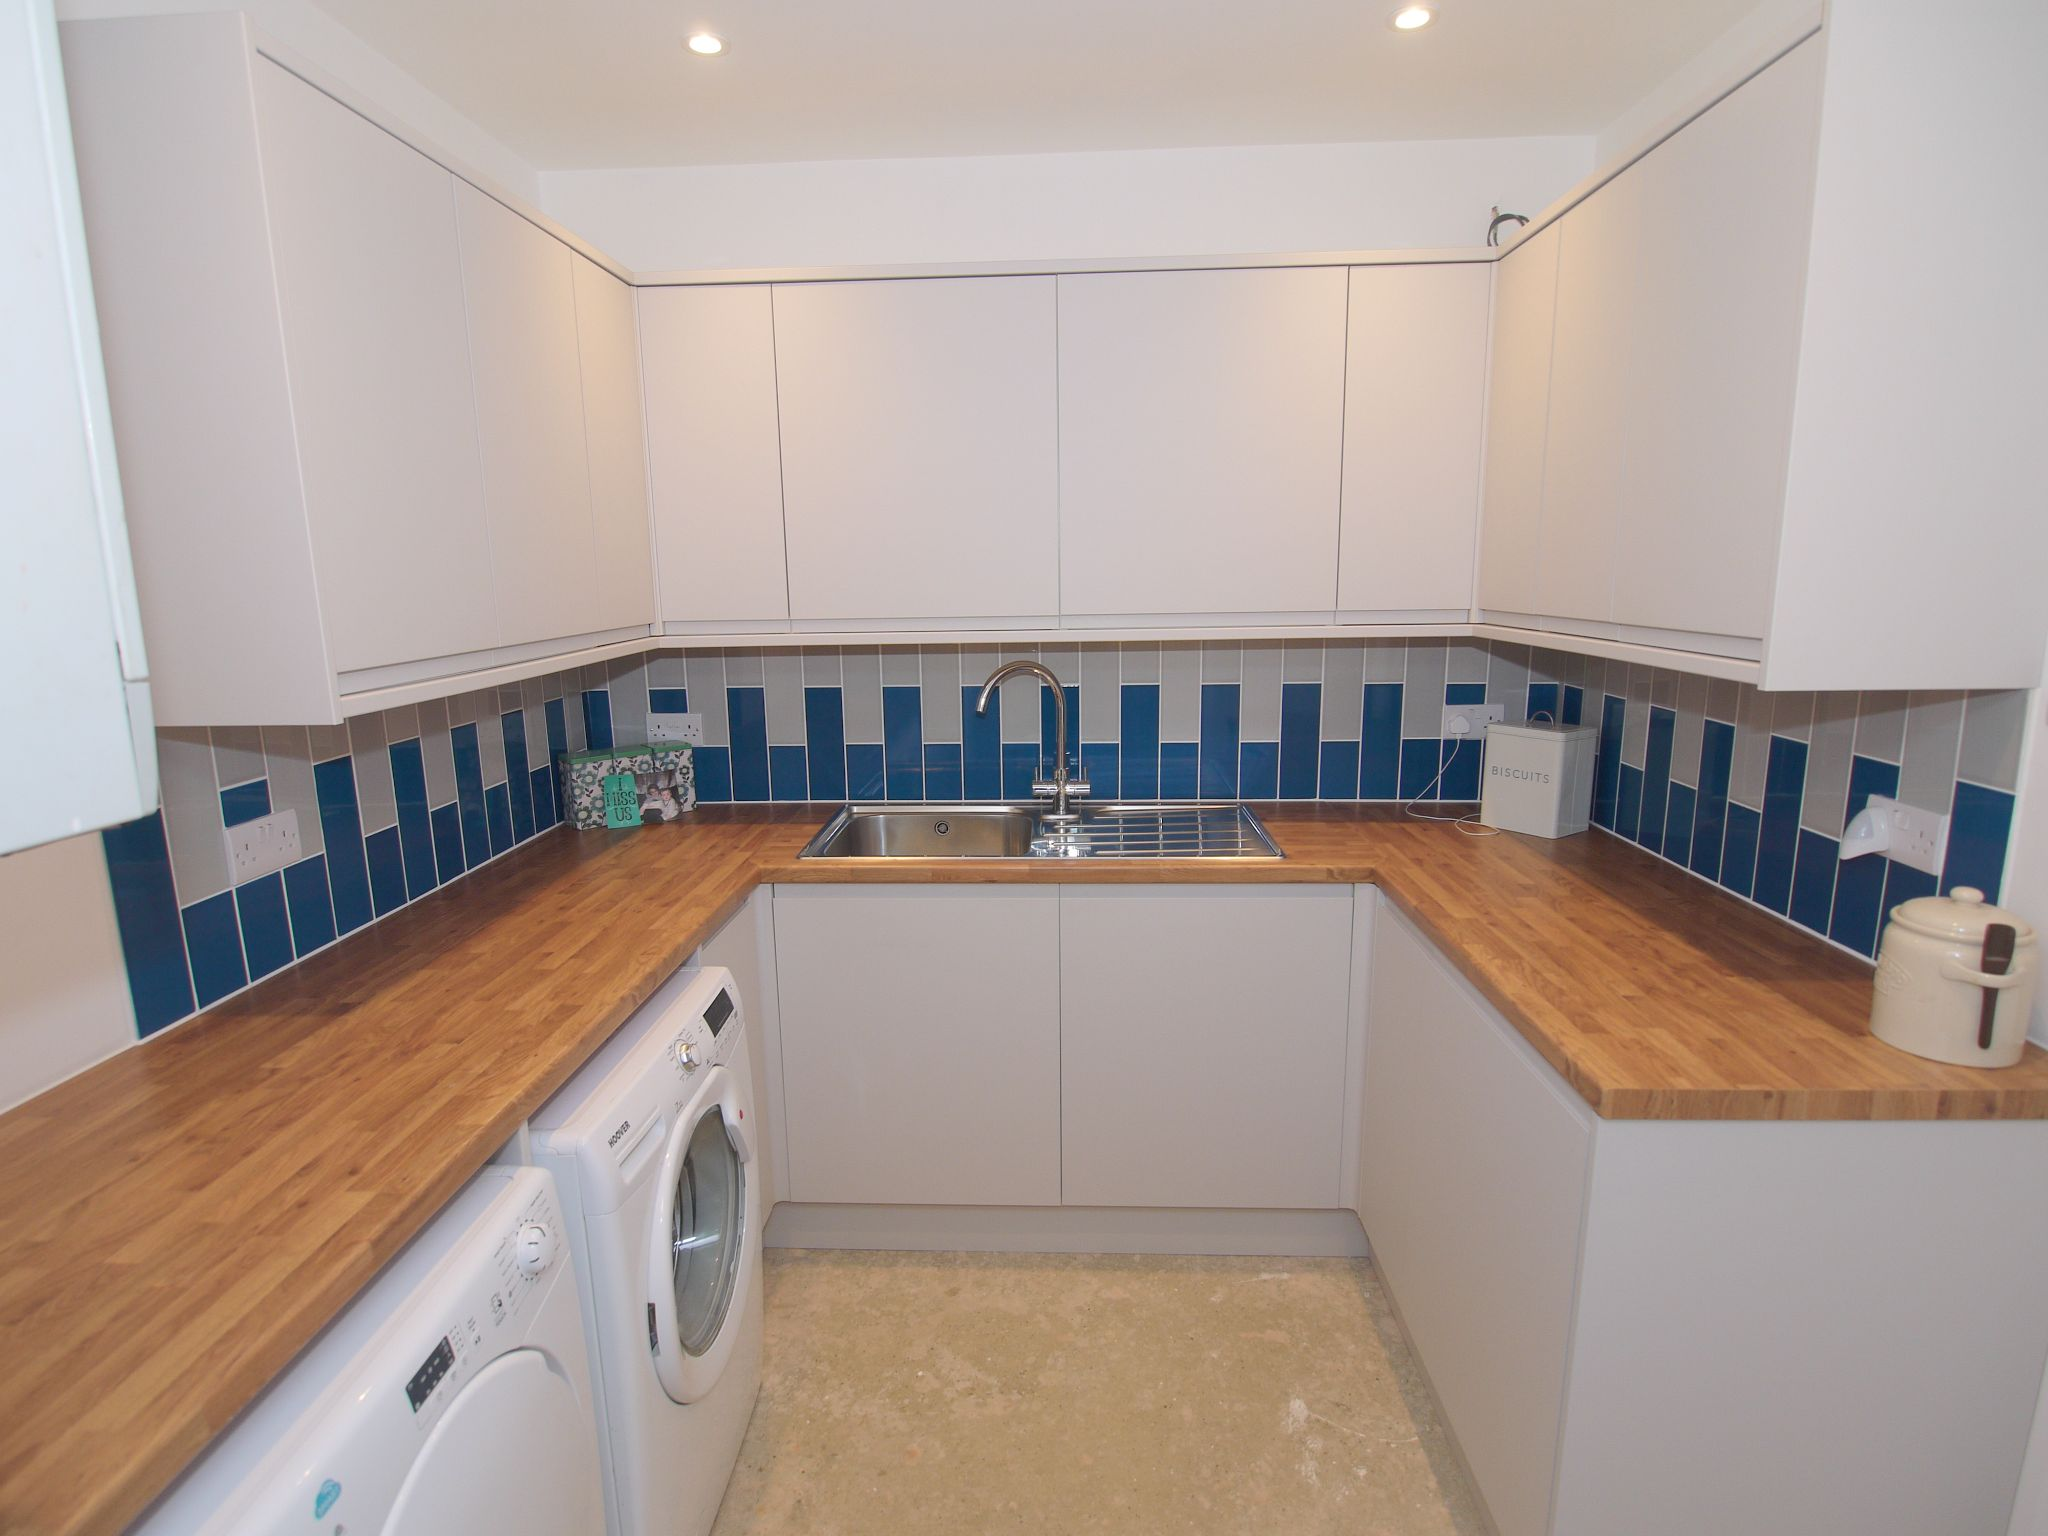 5 bedroom detached house Sold in Sevenoaks - Photograph 7